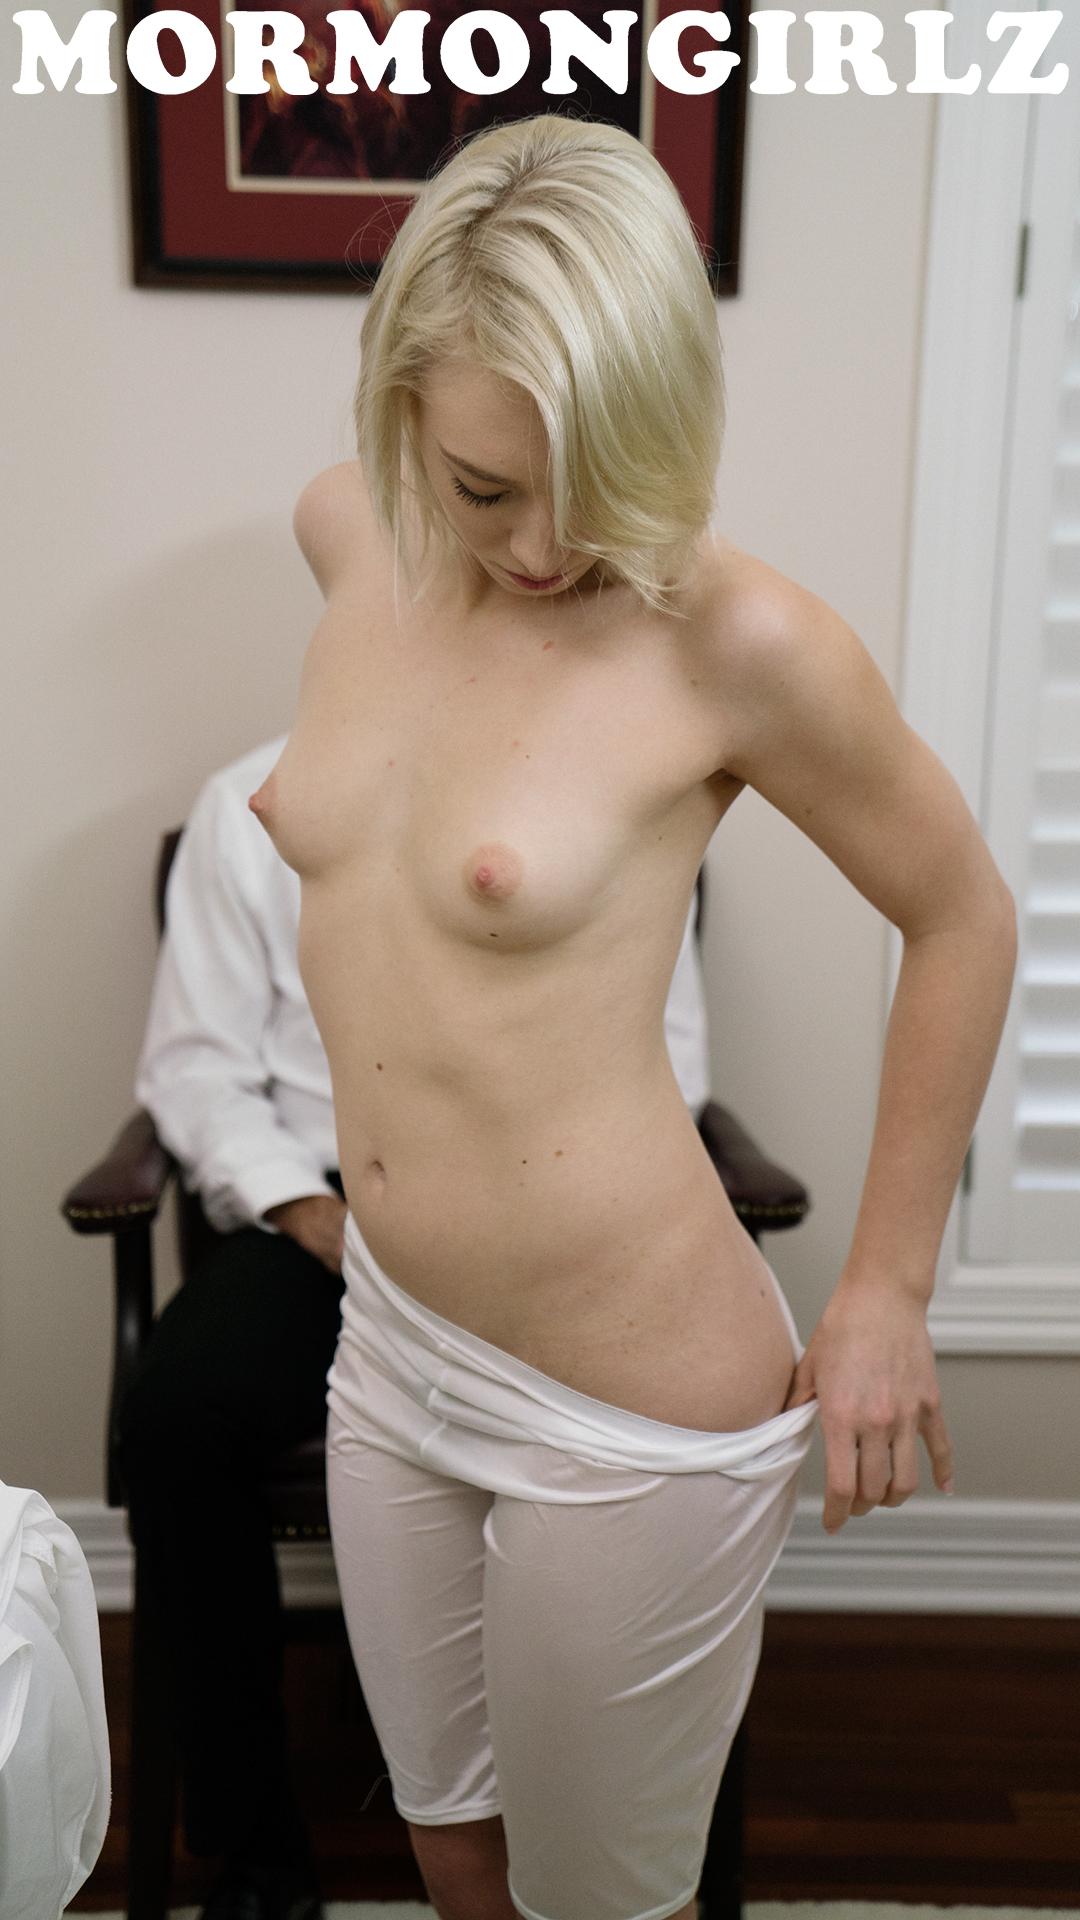 122_mormongirlz_2